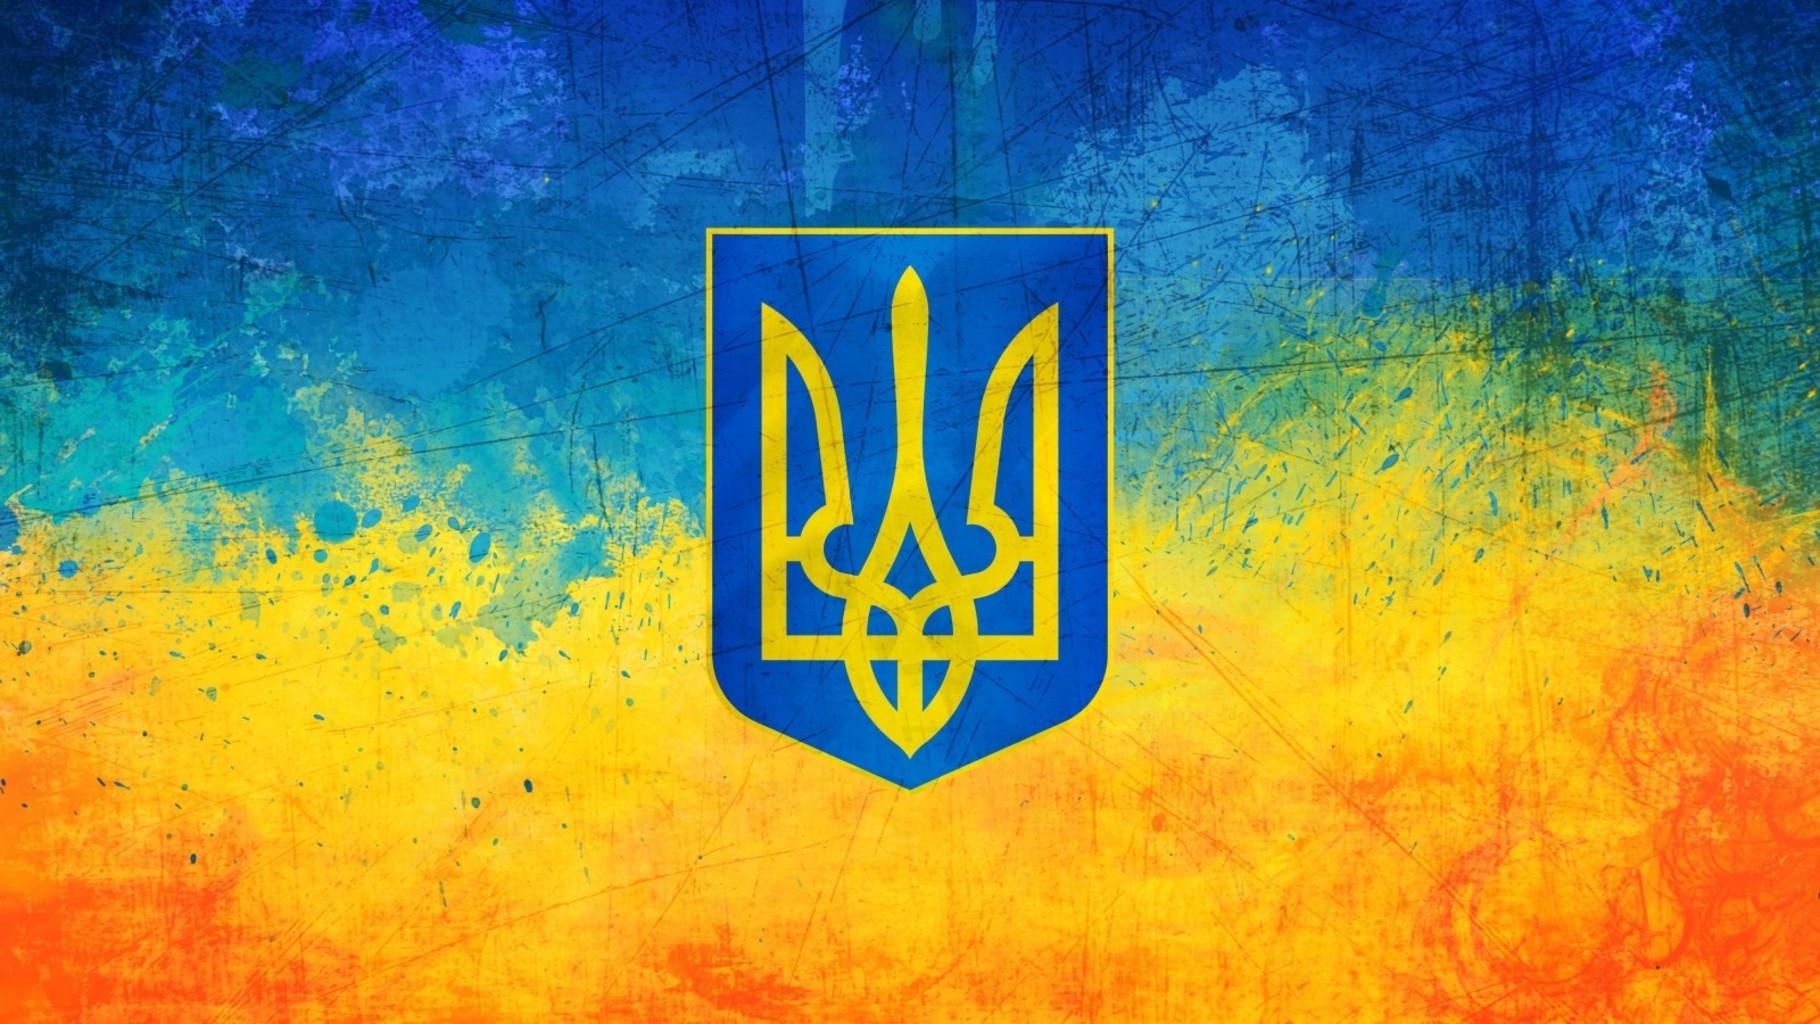 Картинках, картинки украинского флага и герба